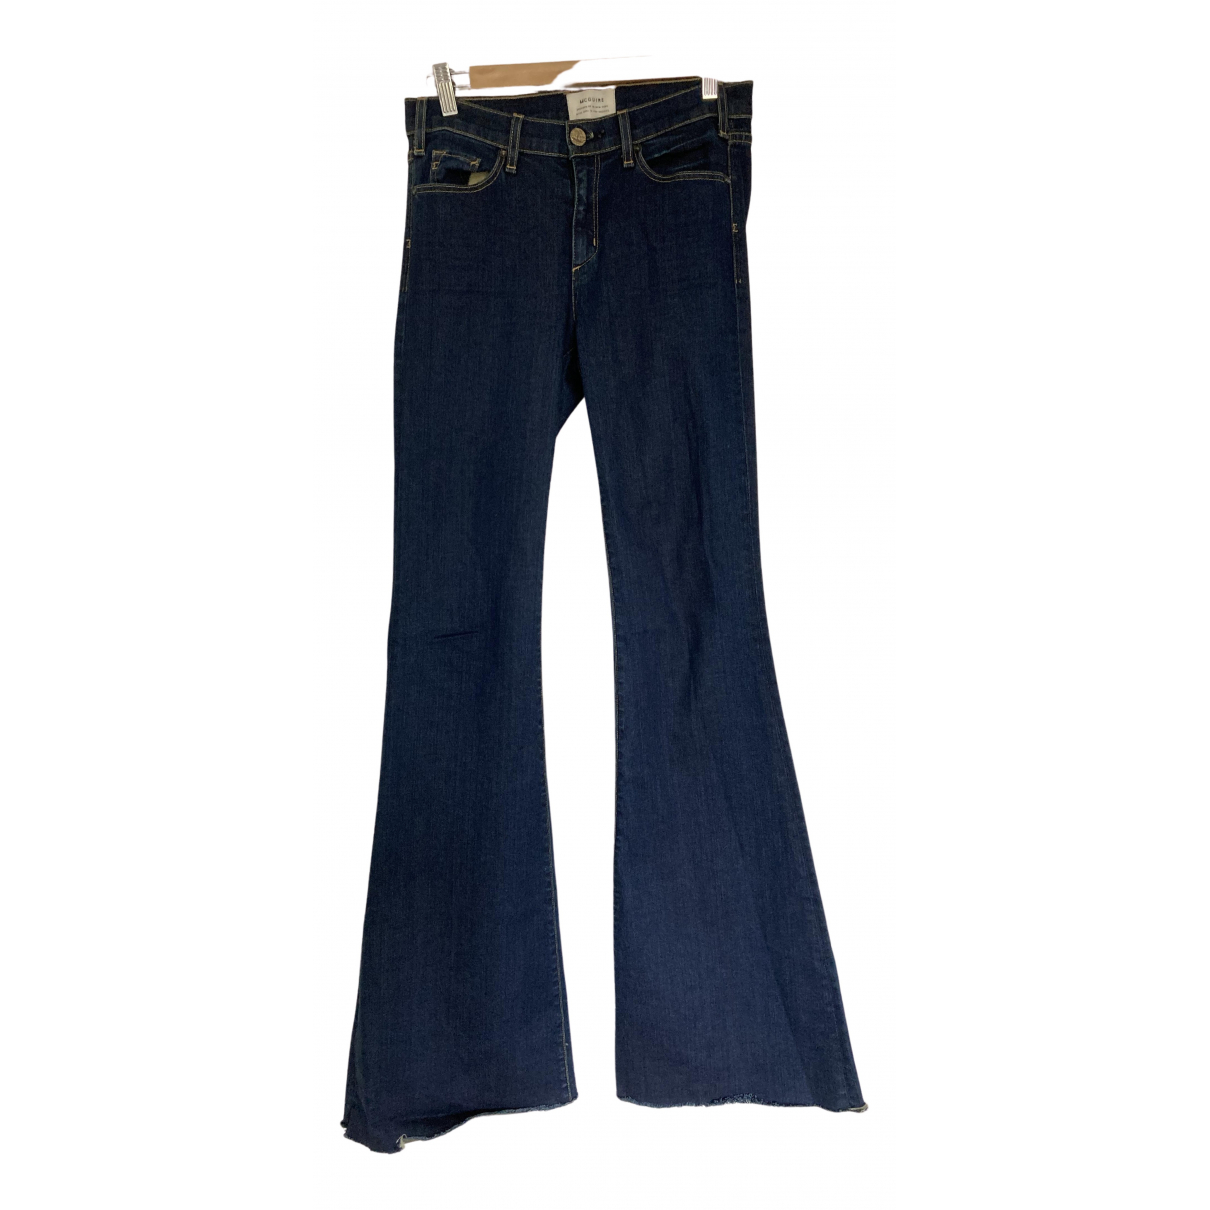 Mcguire N Blue Denim - Jeans Jeans for Women 29 US